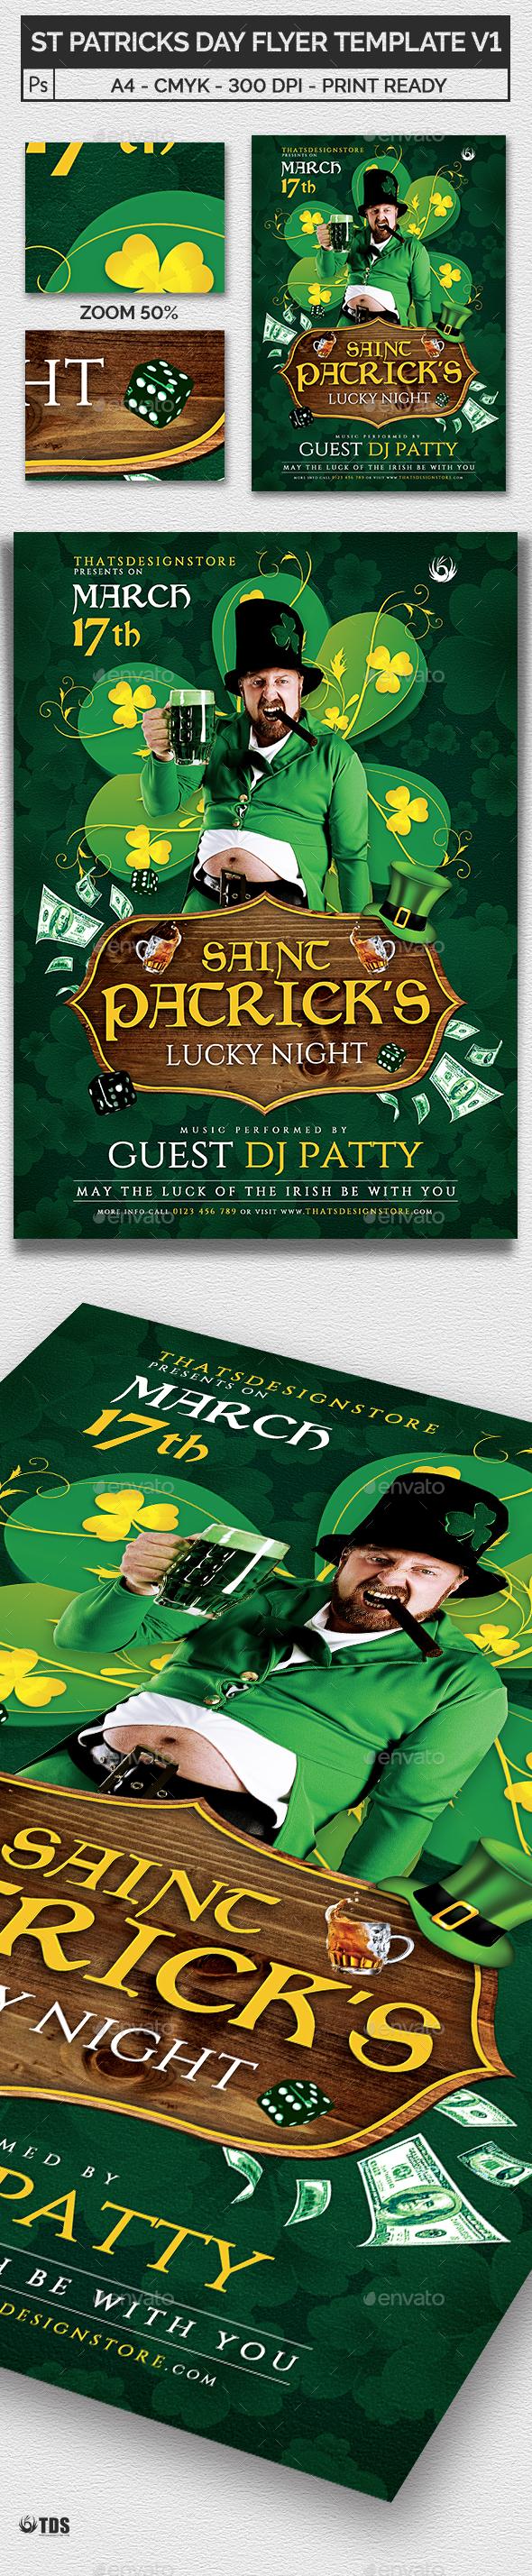 Saint Patricks Day Flyer Template V1 - Print Templates